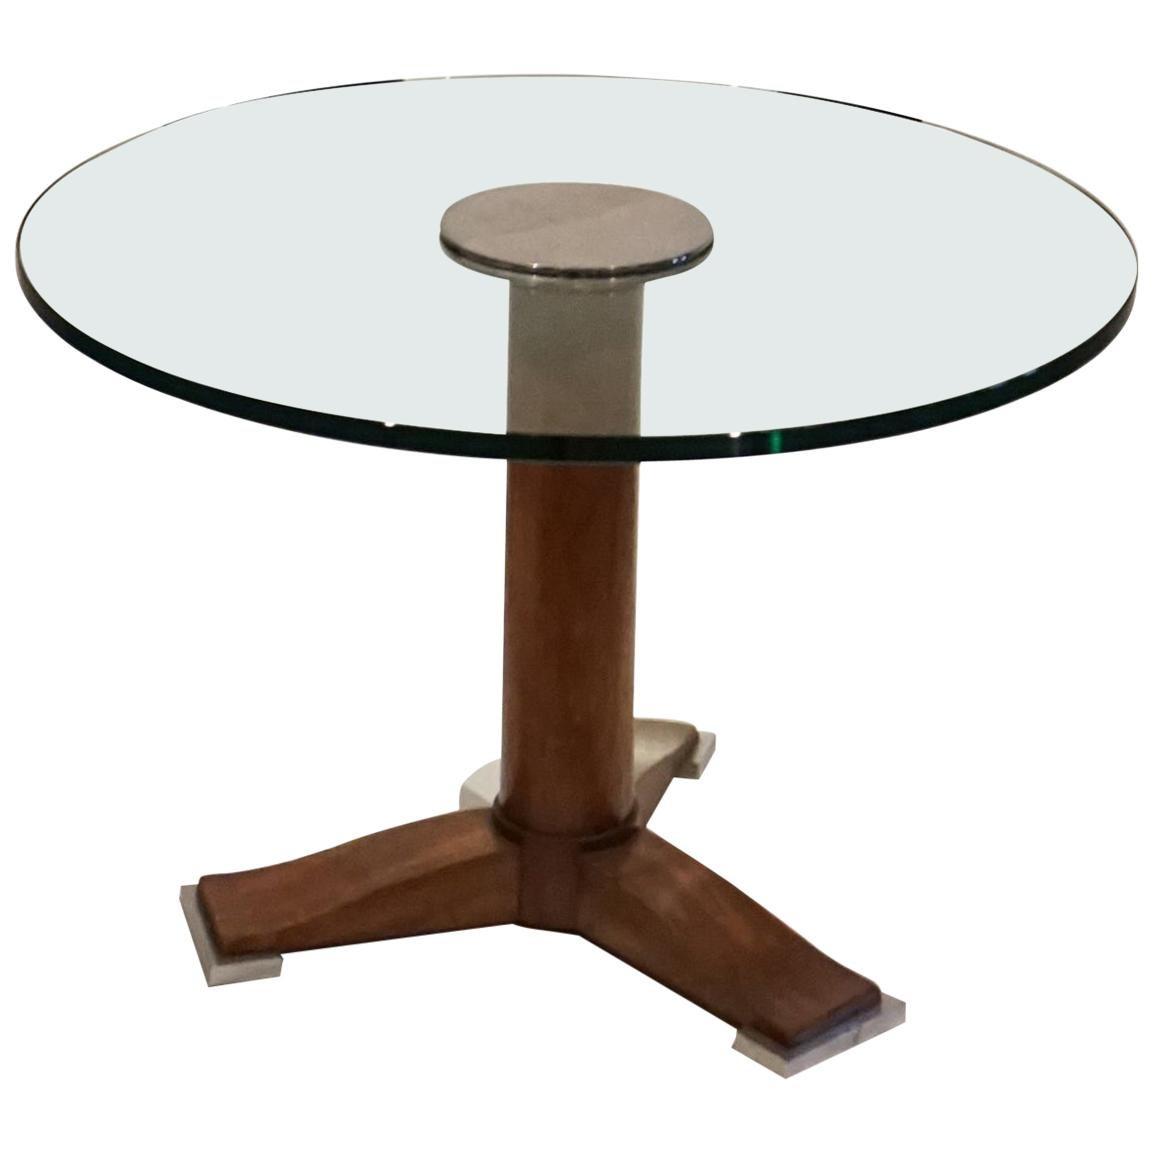 1930s Designer Coffee Table Designed by Jules Leleu